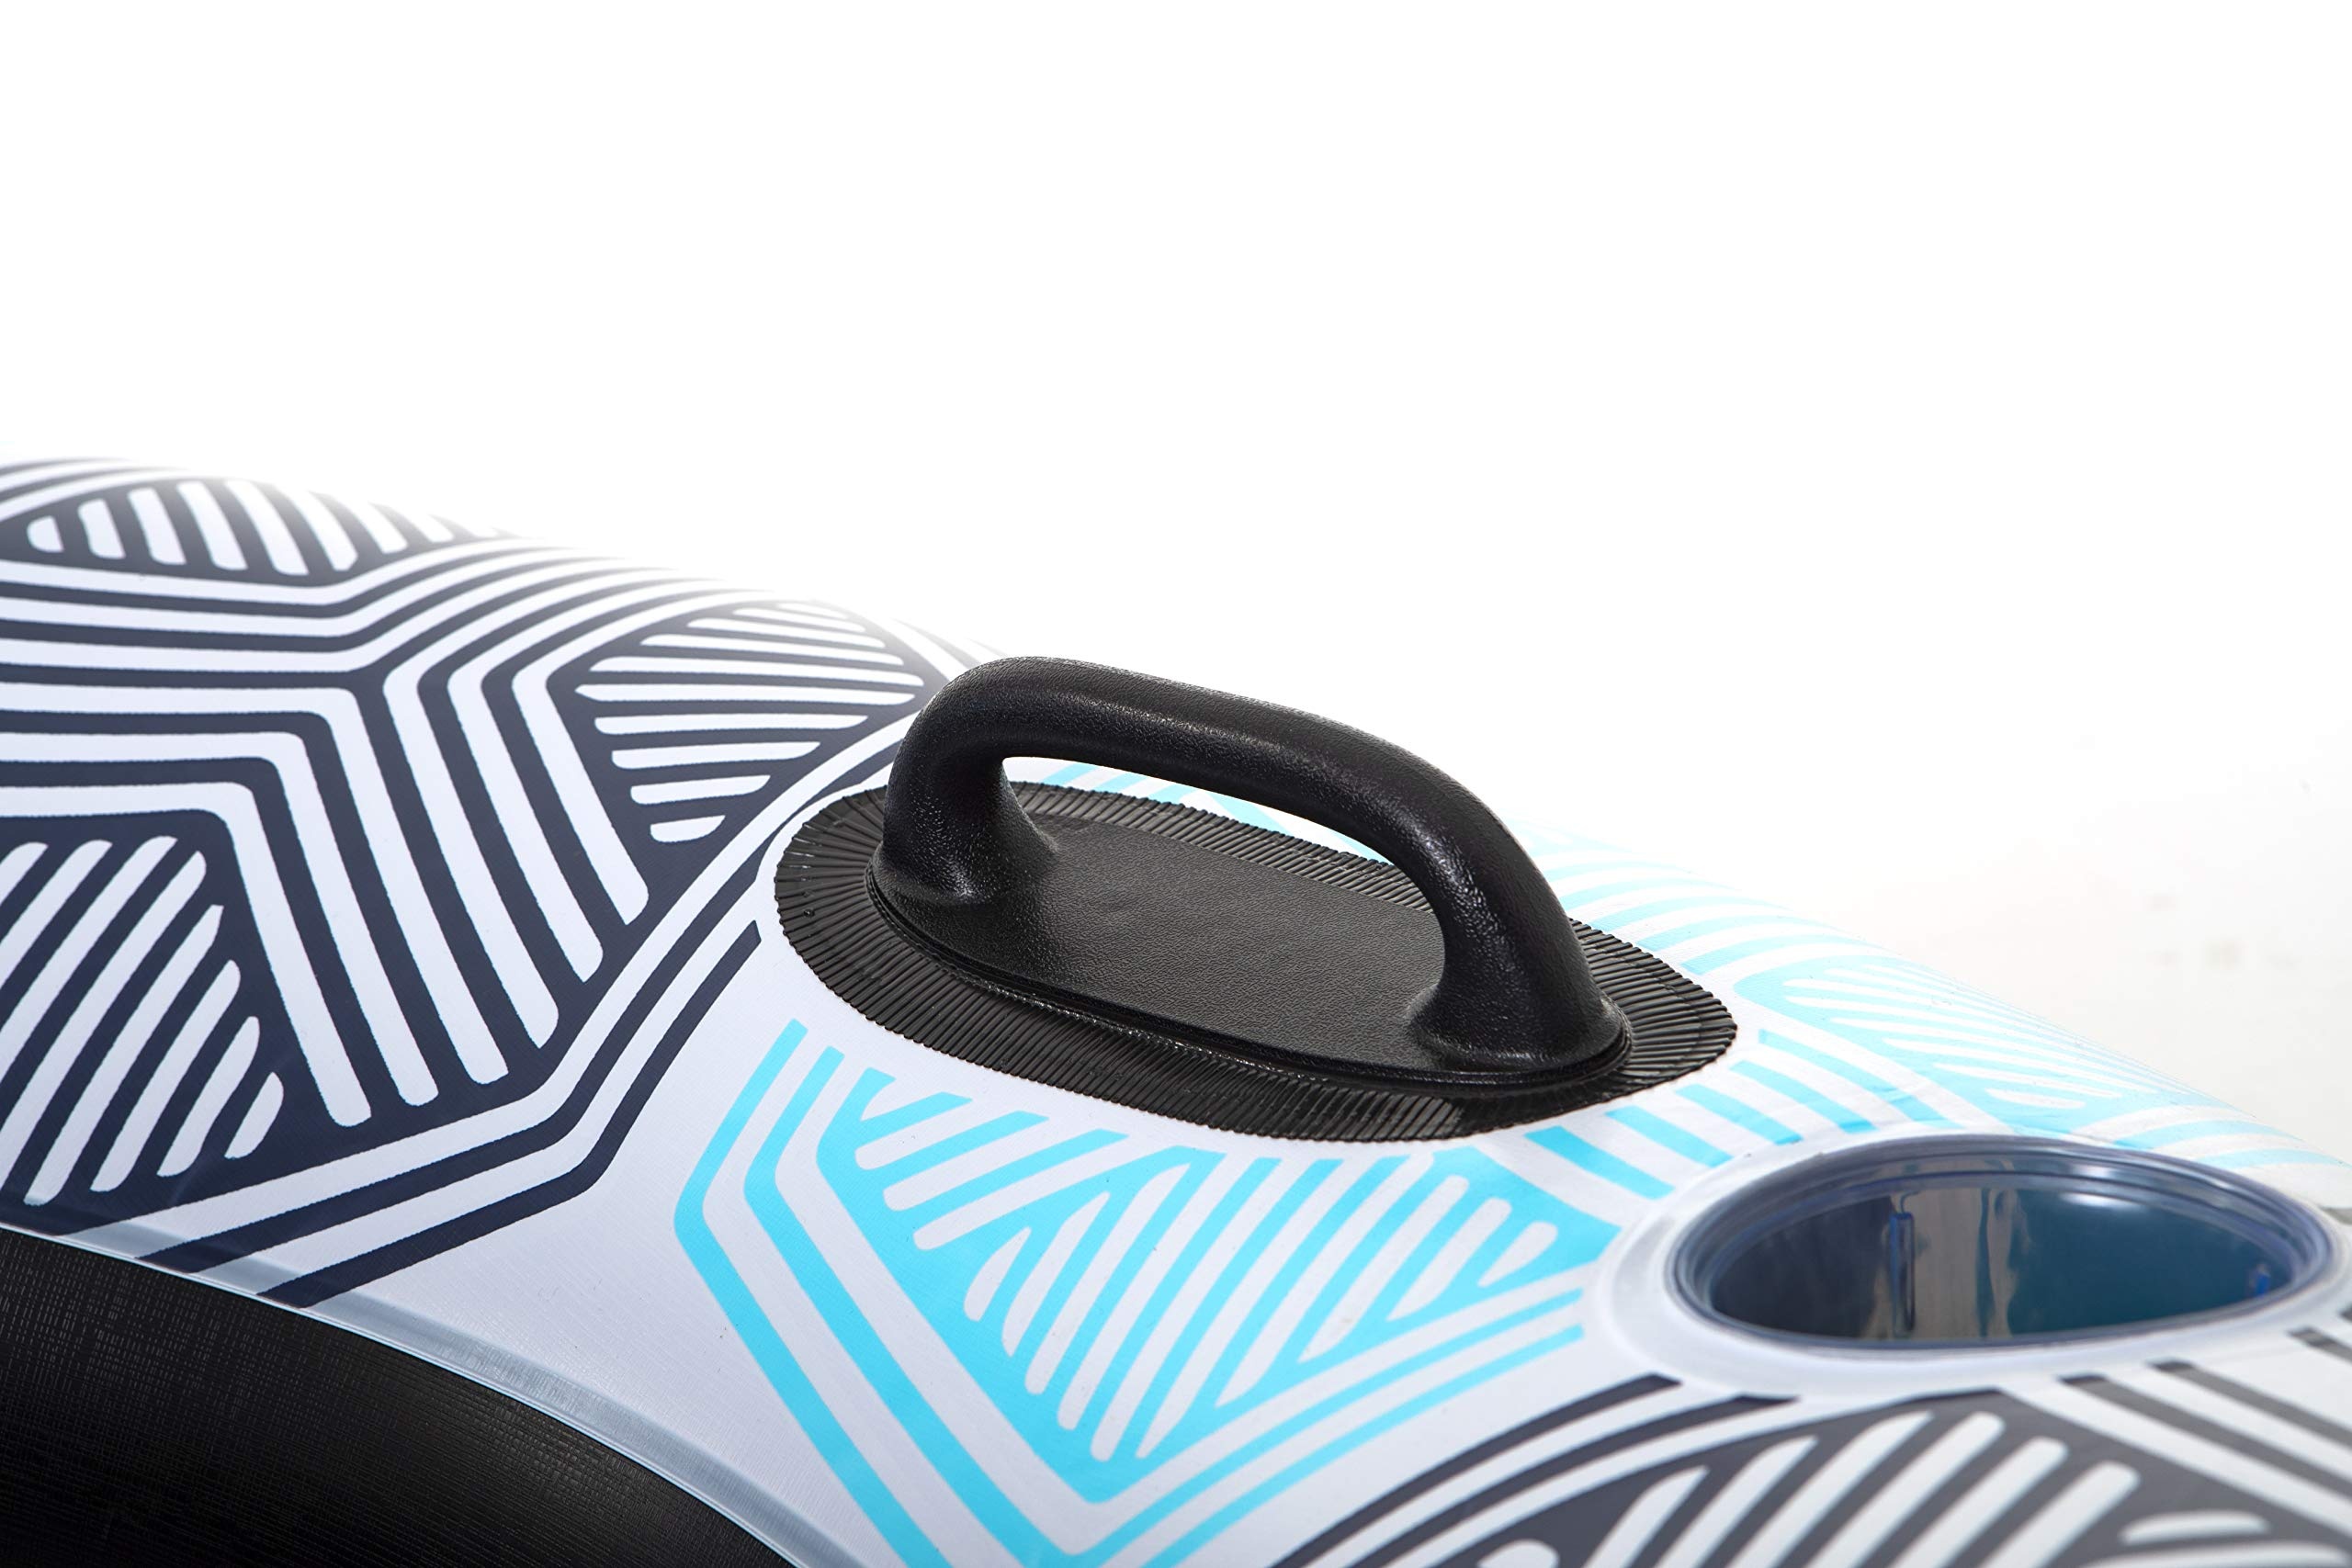 Bestway CoolerZ Rapid Rider Inflatable Blow Up Pool Chair Tube (12 Pack) by Bestway (Image #4)